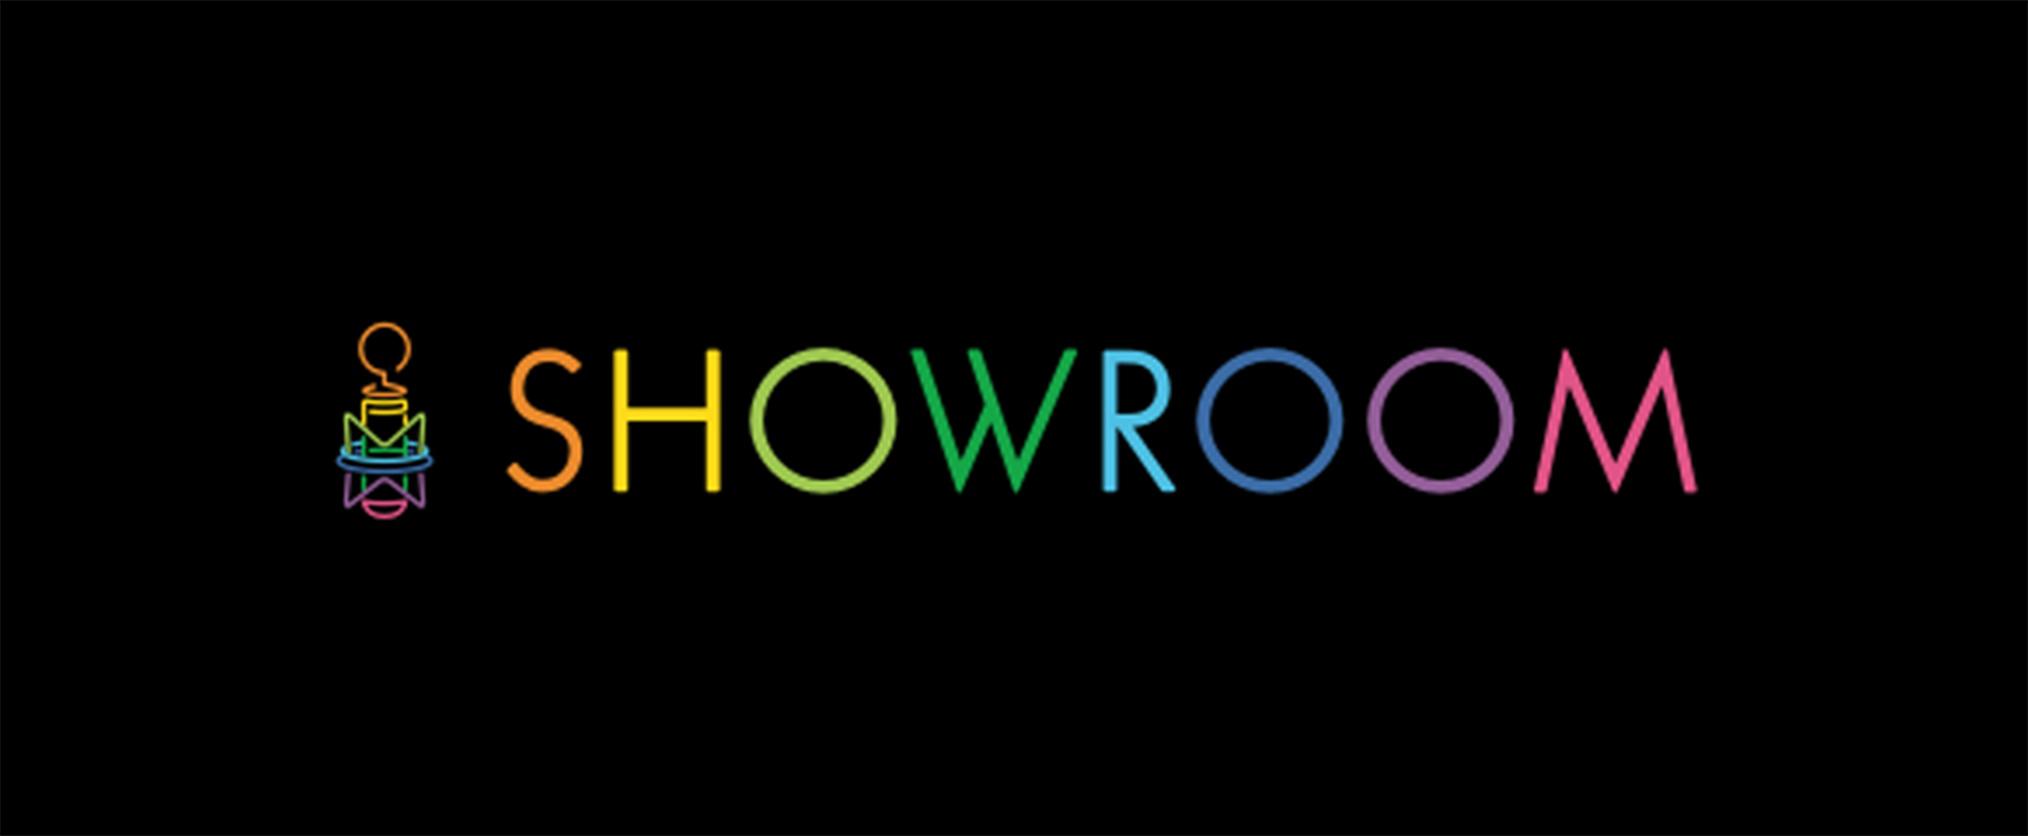 SHOWROOMオフィシャル番組の配信